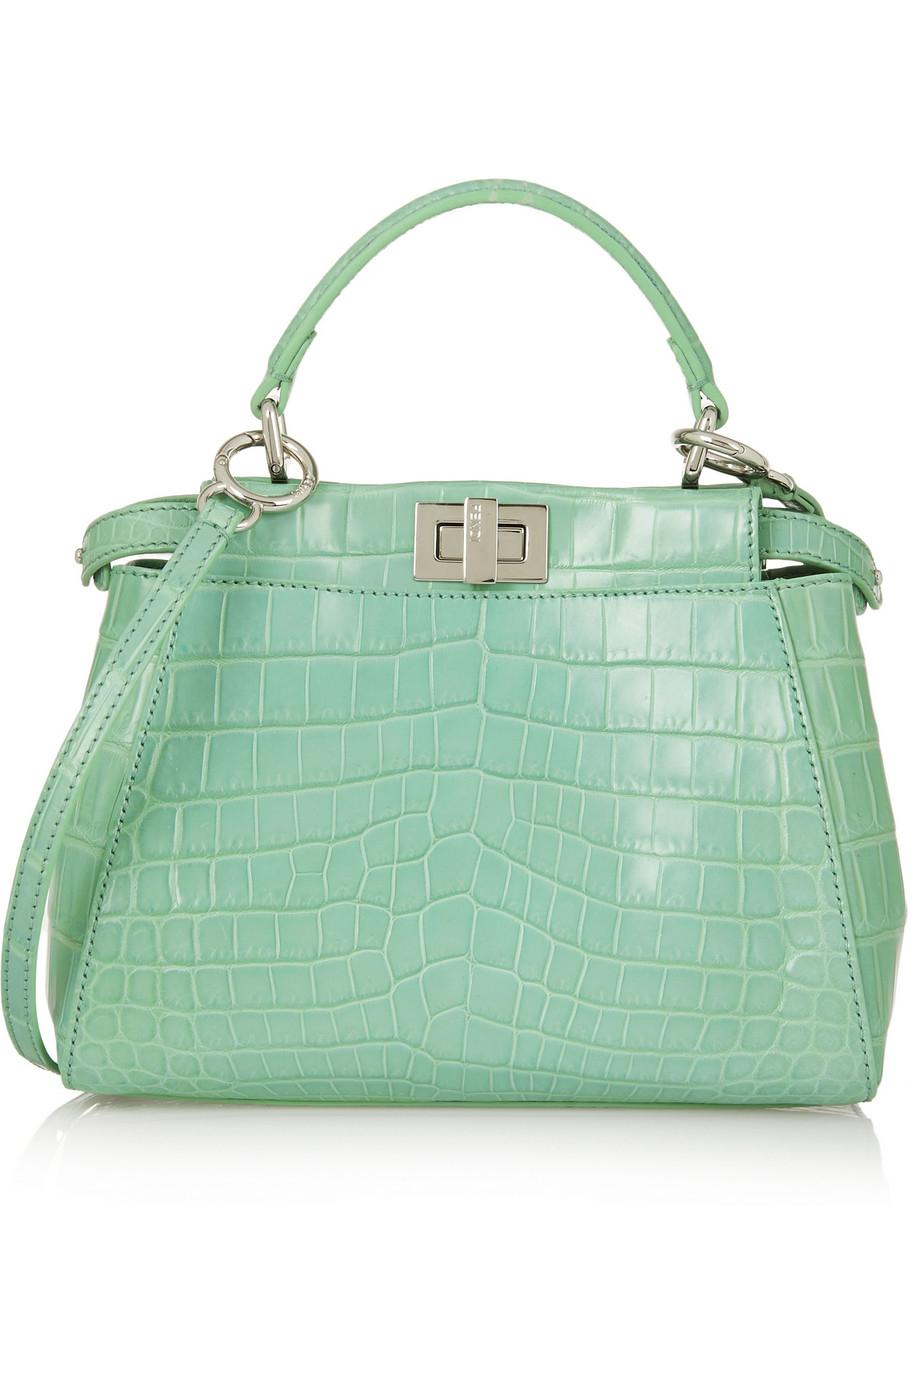 ... new style lyst fendi peekaboo small crocodile tote in green 09989 9a399  netherlands fendi turquoise blue ... 34fa17115ba7b